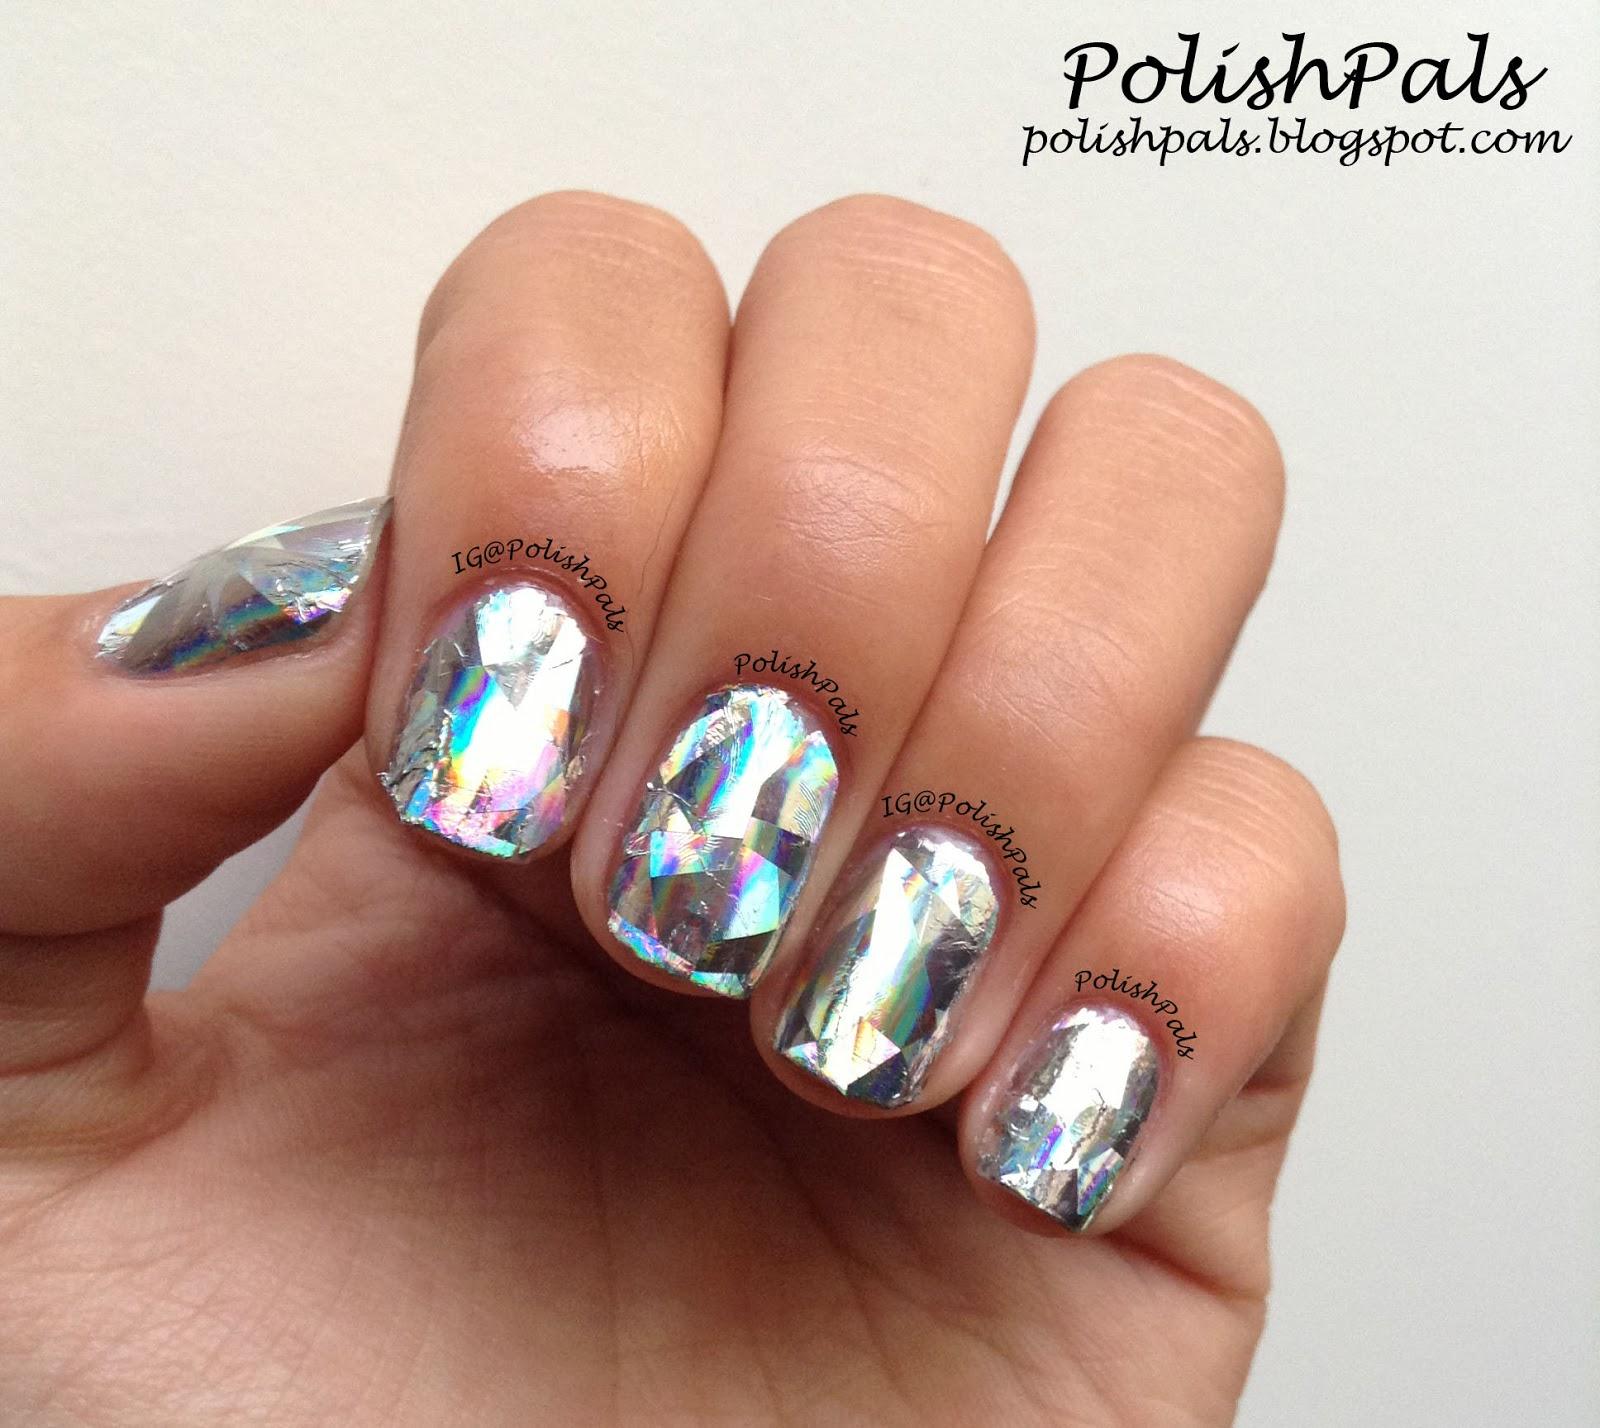 polish pals nail foil review from kkcenterhk